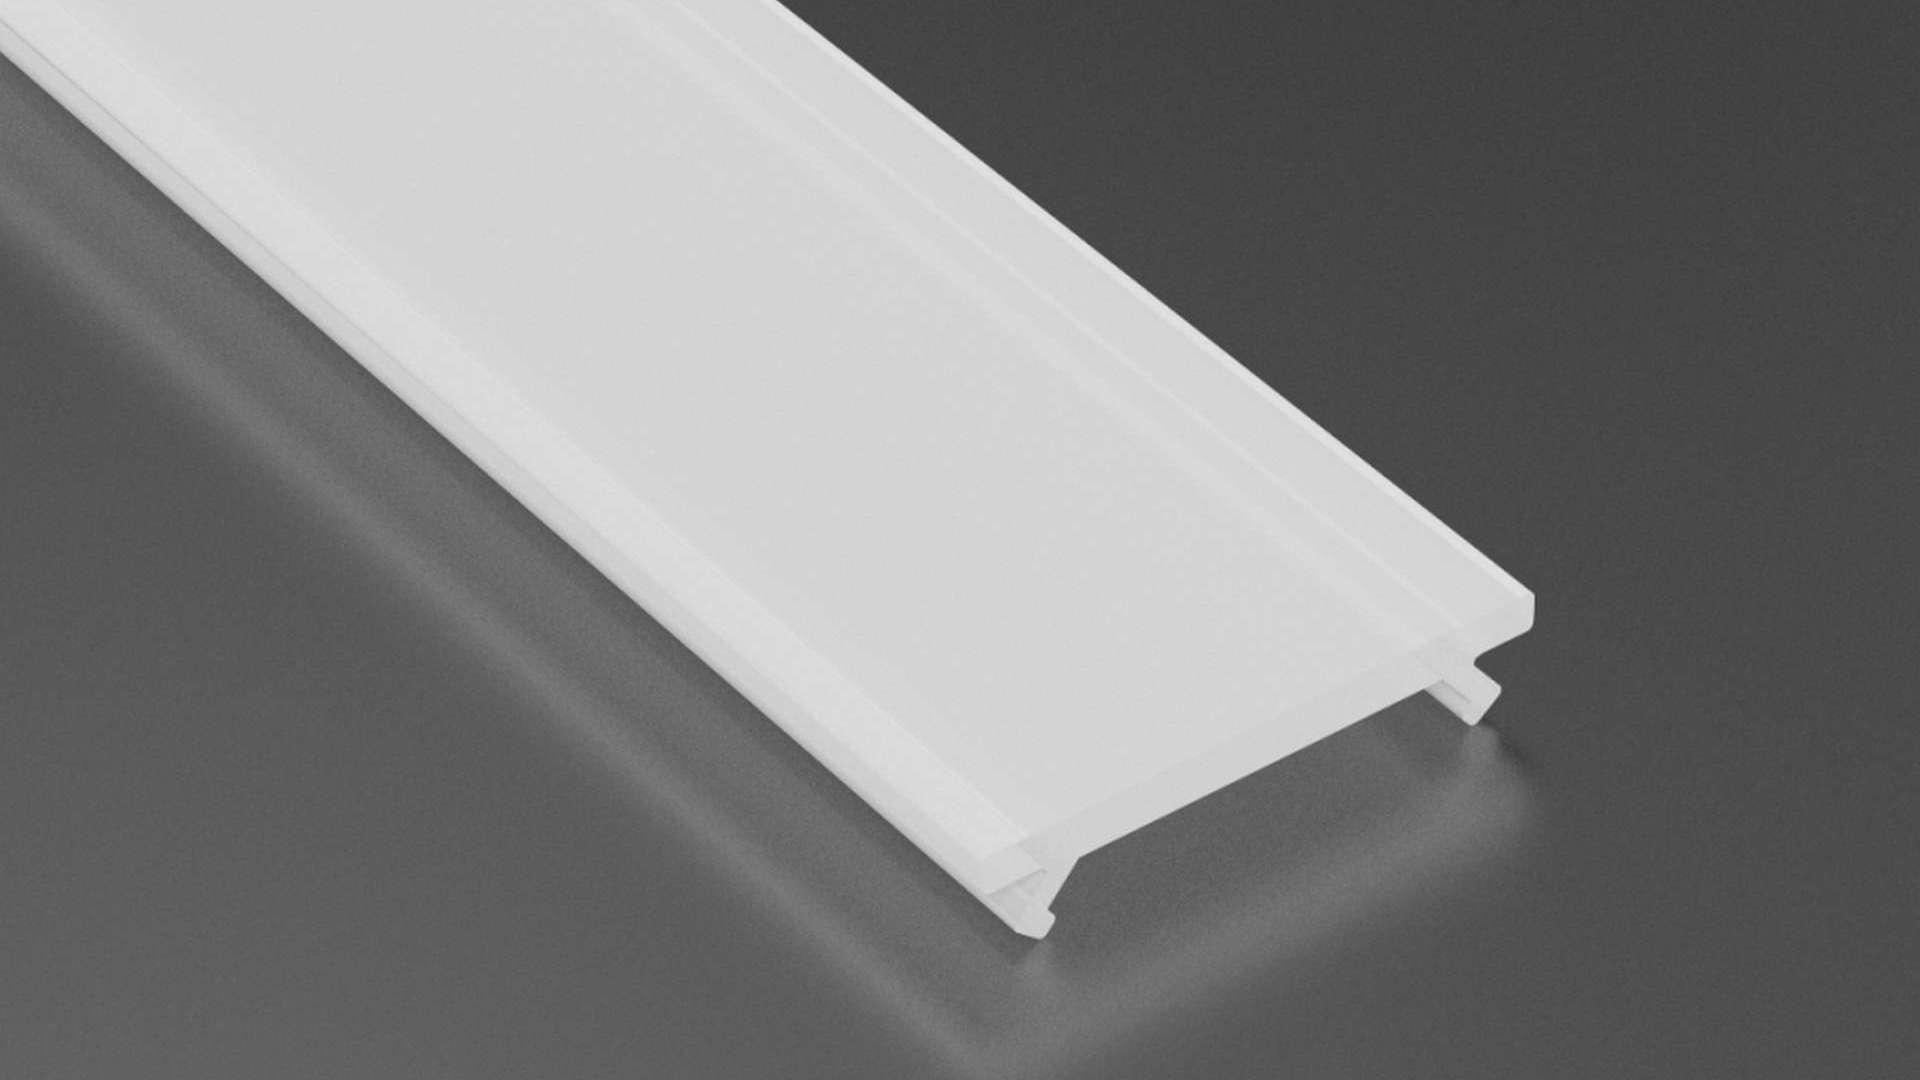 LUMINES BASIC cover PC milky 1 m